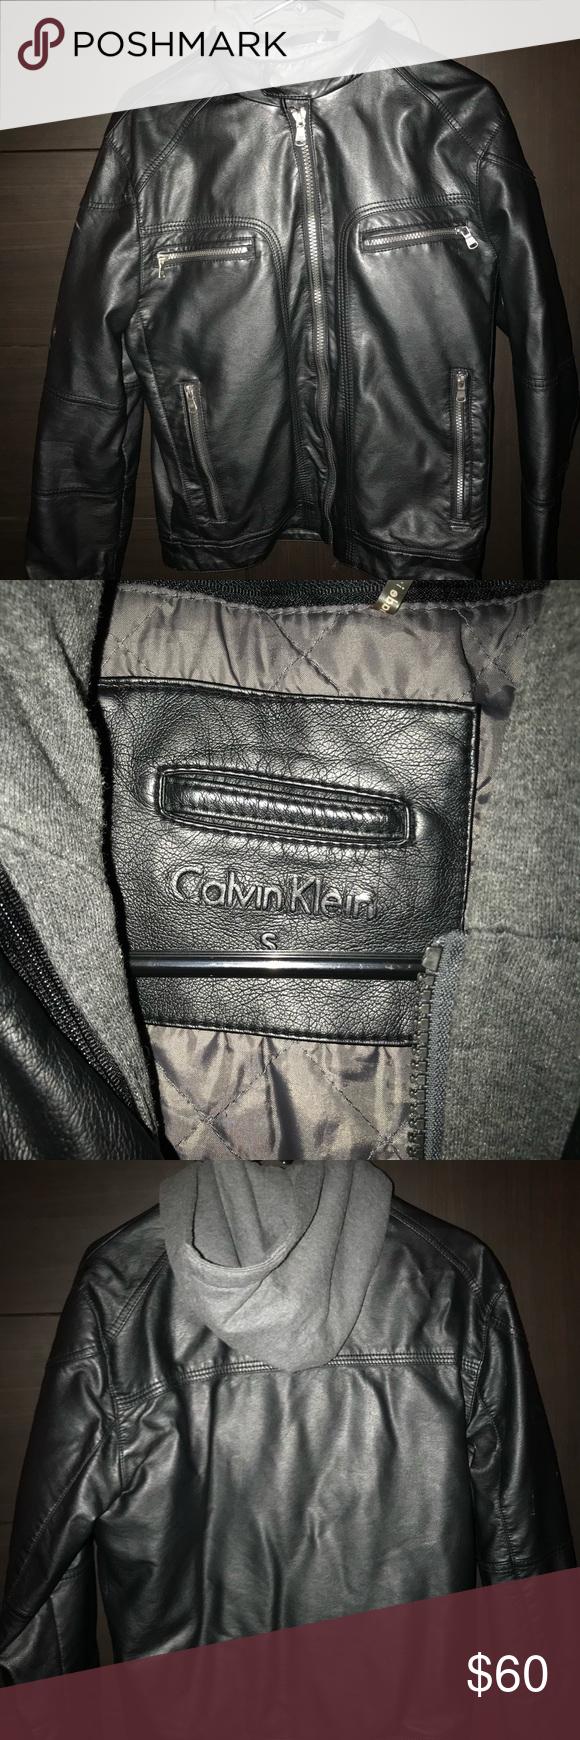 Calvin Klein Leather Jacket Great condition, lightly worn